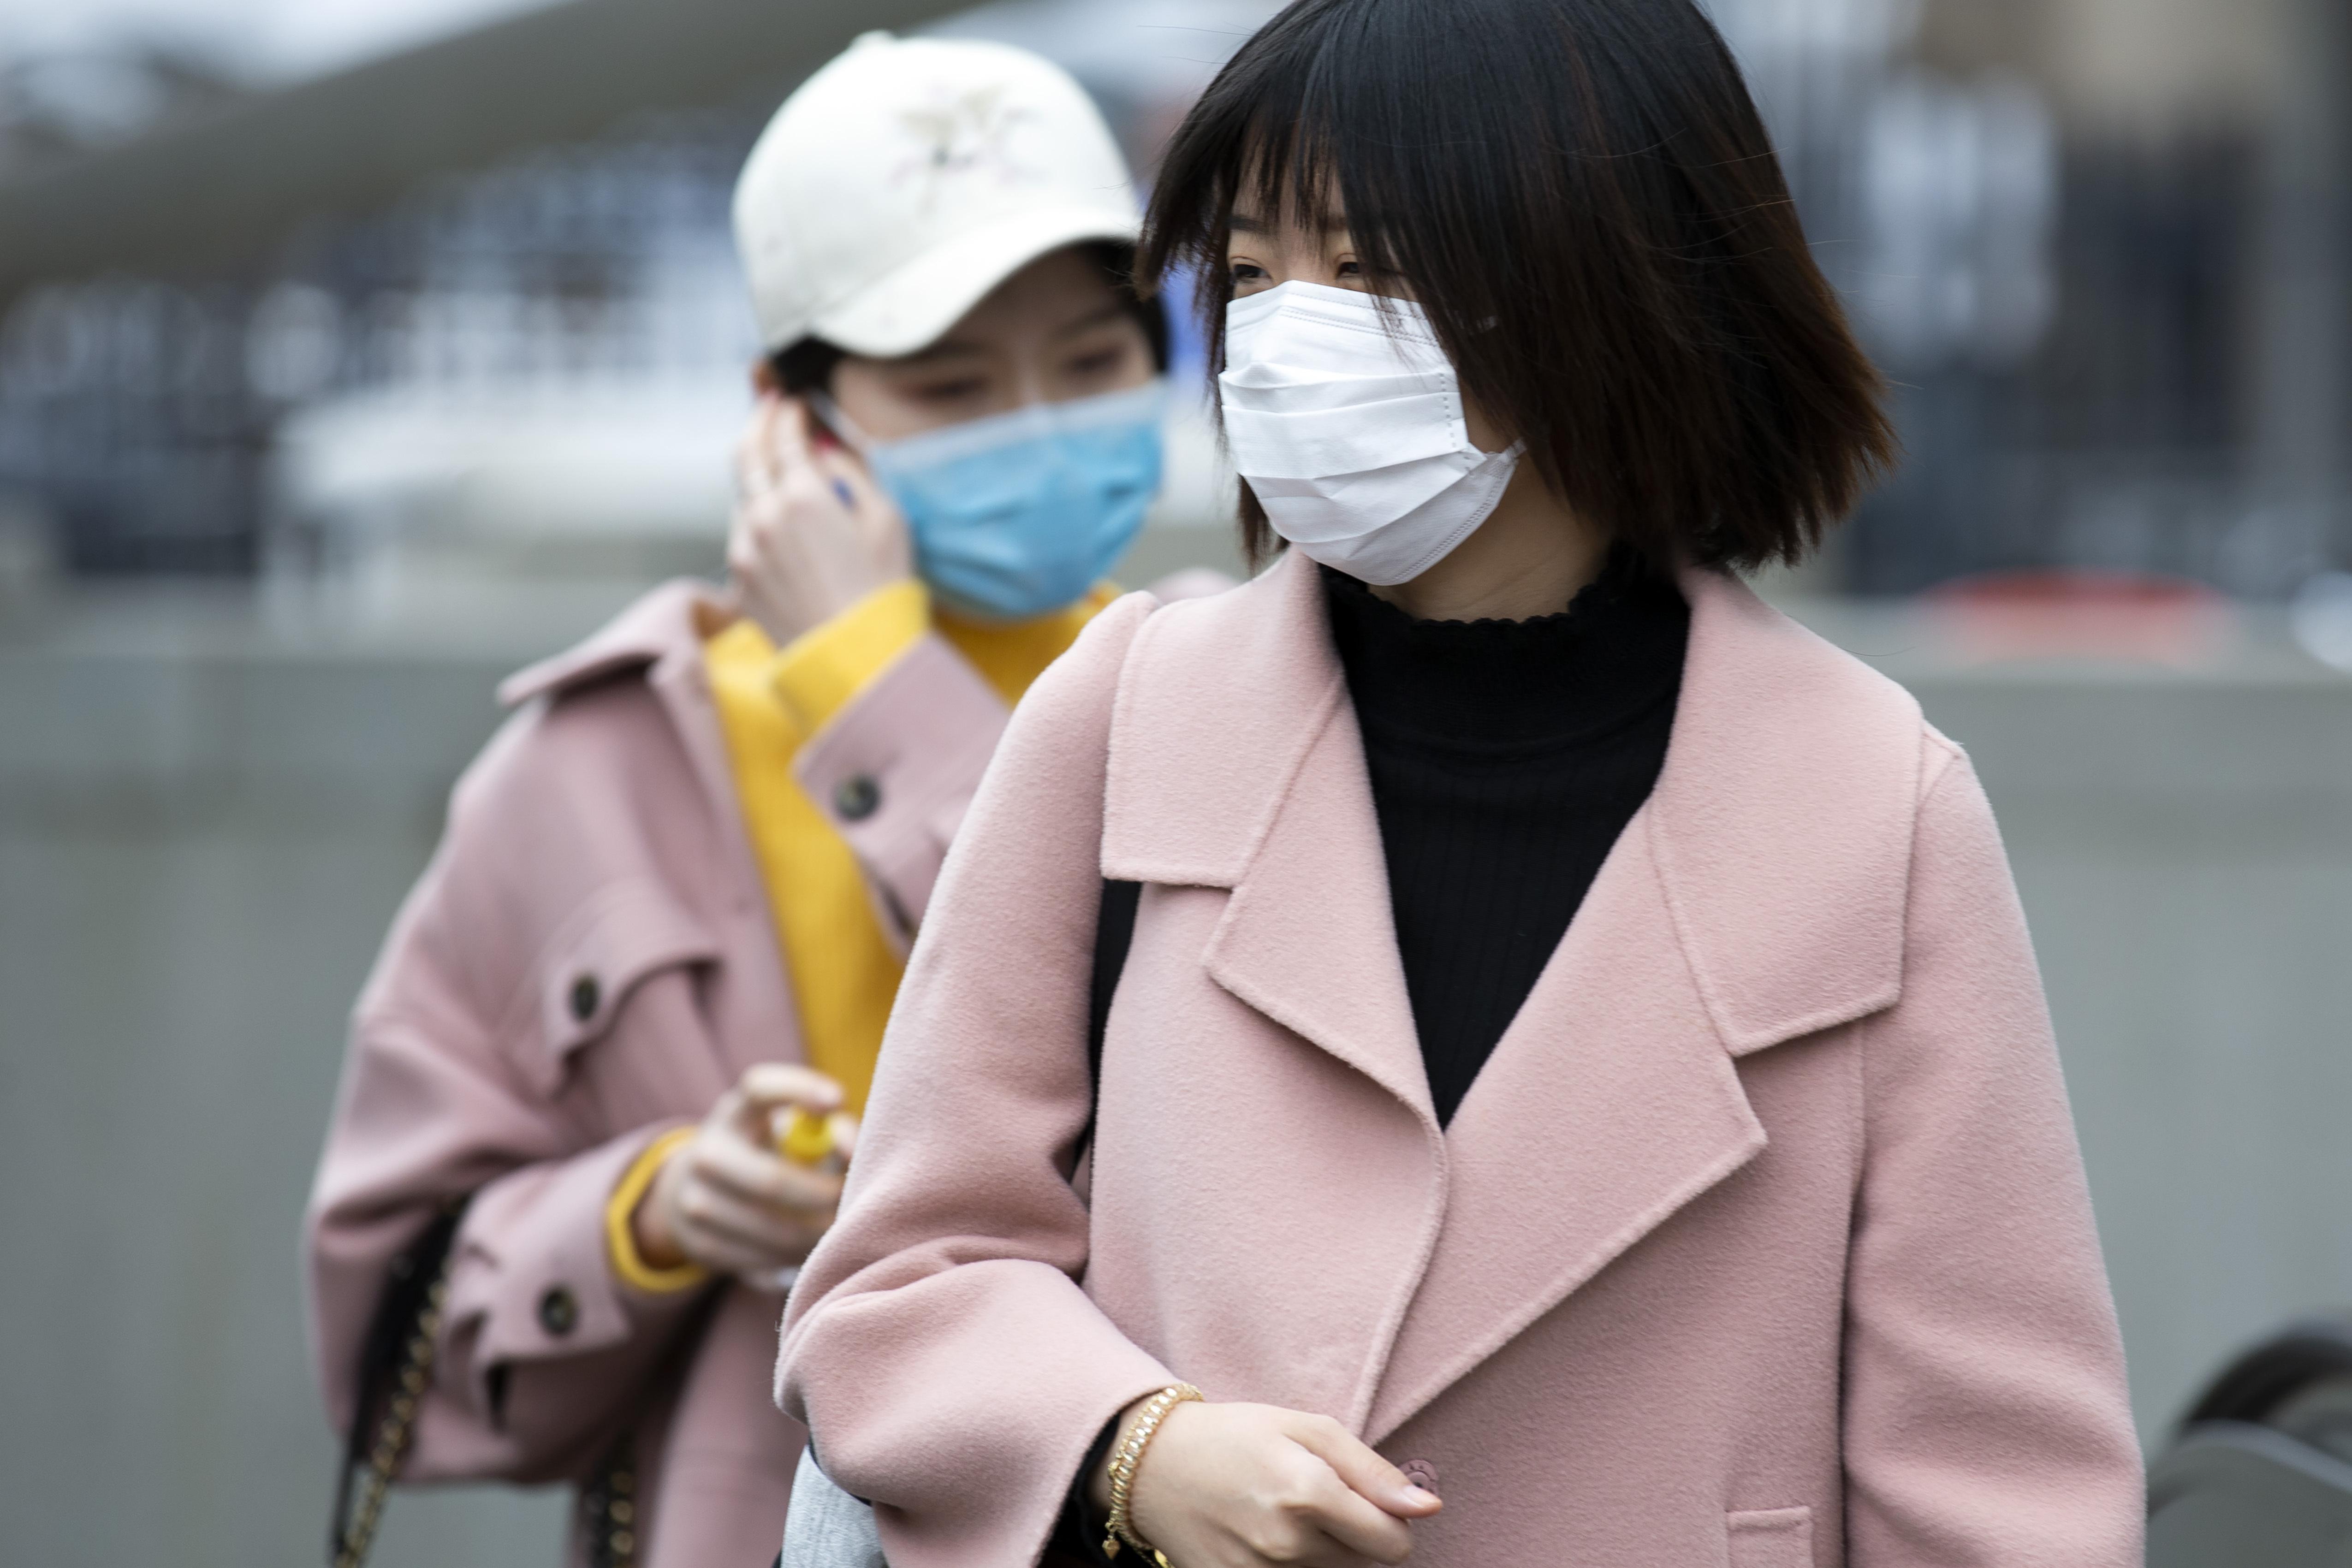 Women wear masks as they exit the Metro subway at George Washington University in Washington, Wednesday, March 11, 2020.